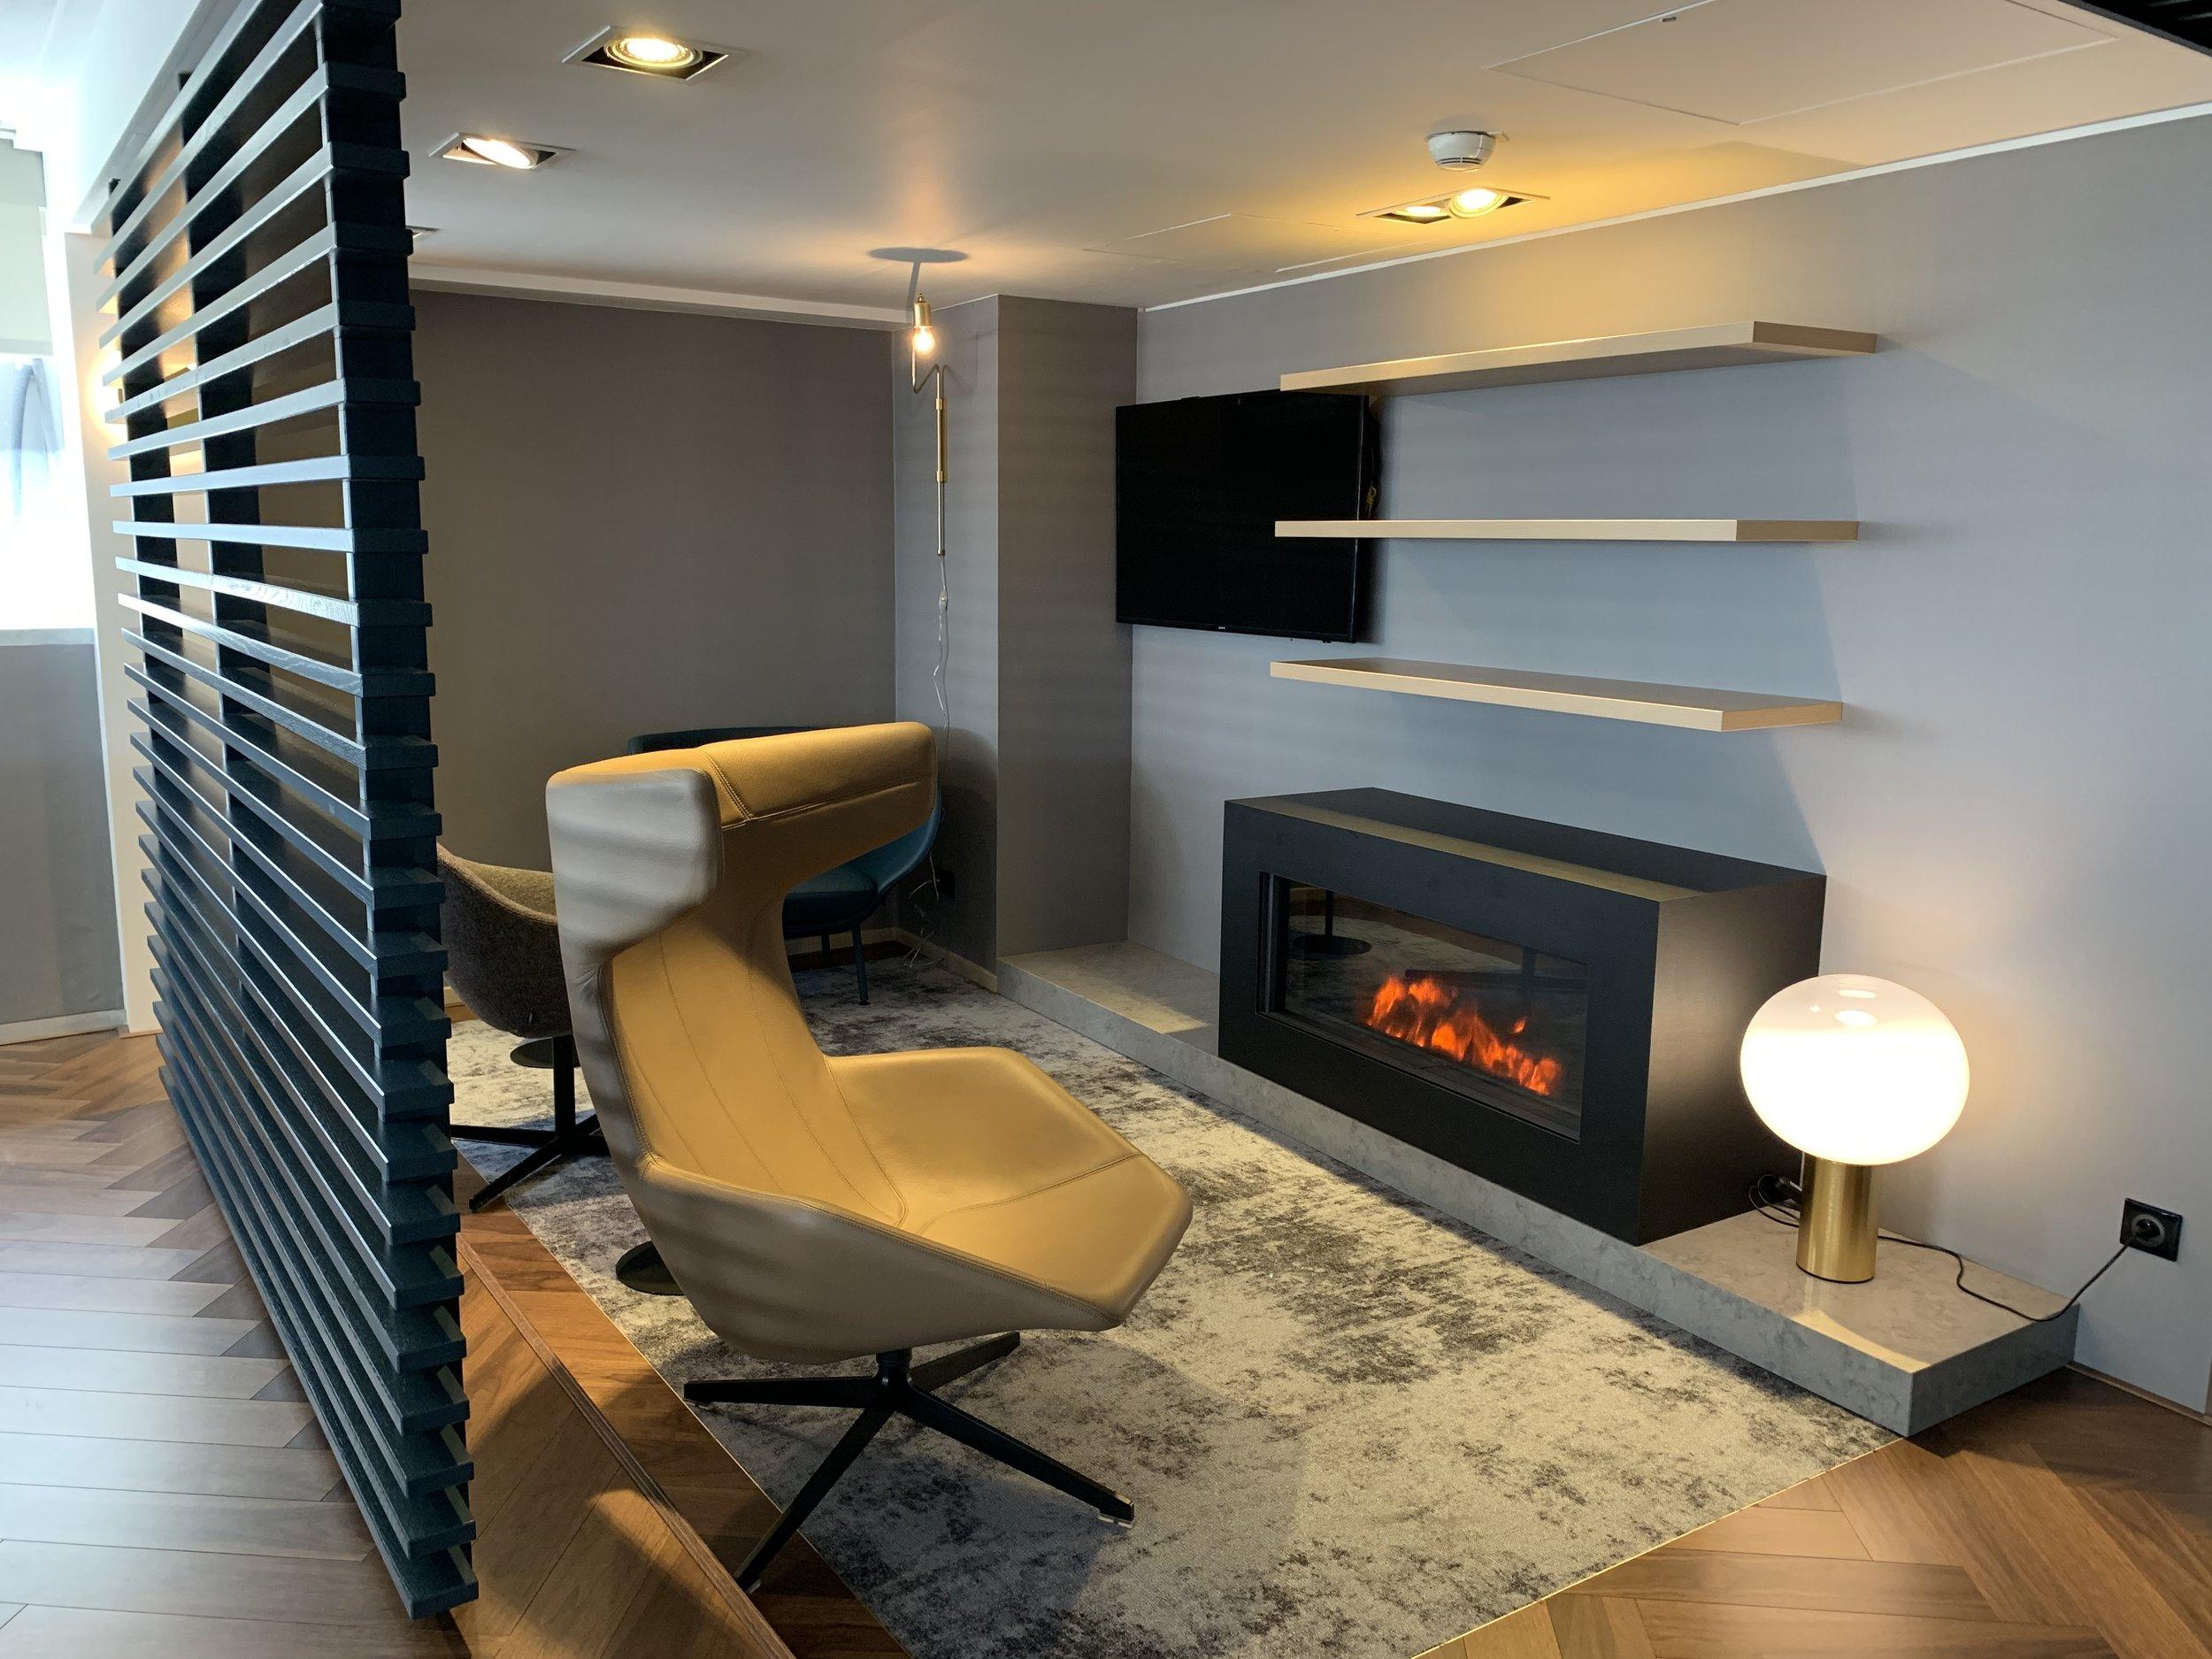 New Refurbished Star Alliance Lounge Paris Charles De Gaulle